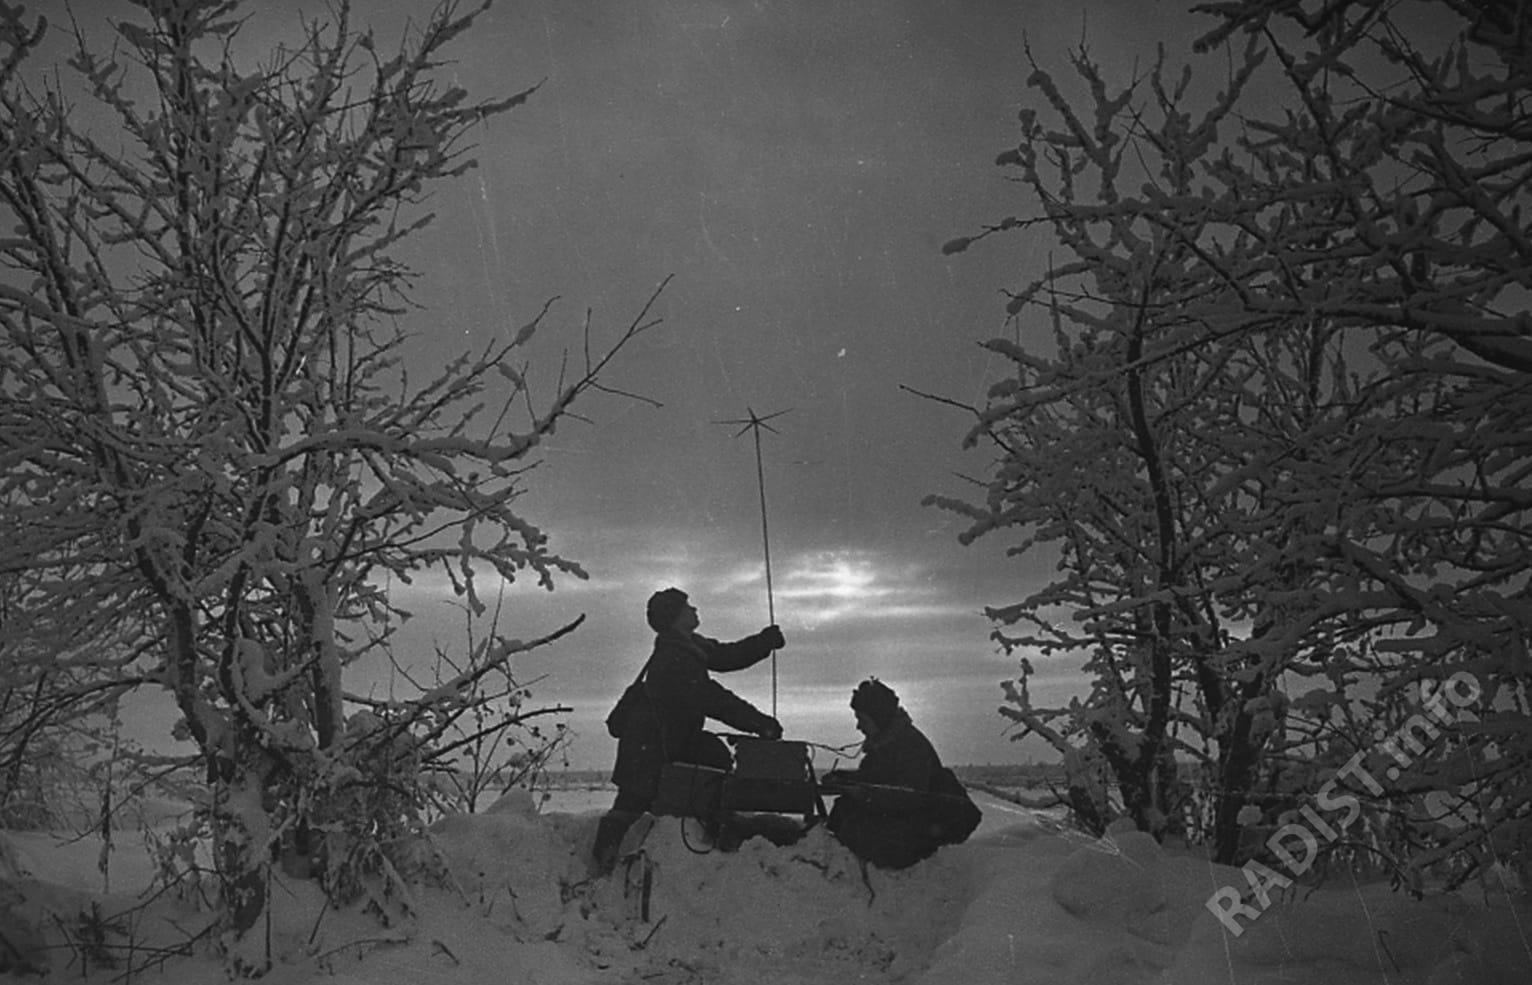 Девушки-радистки Зубарова и Шплякина проверяют радиоаппаратуру, 1942 г.